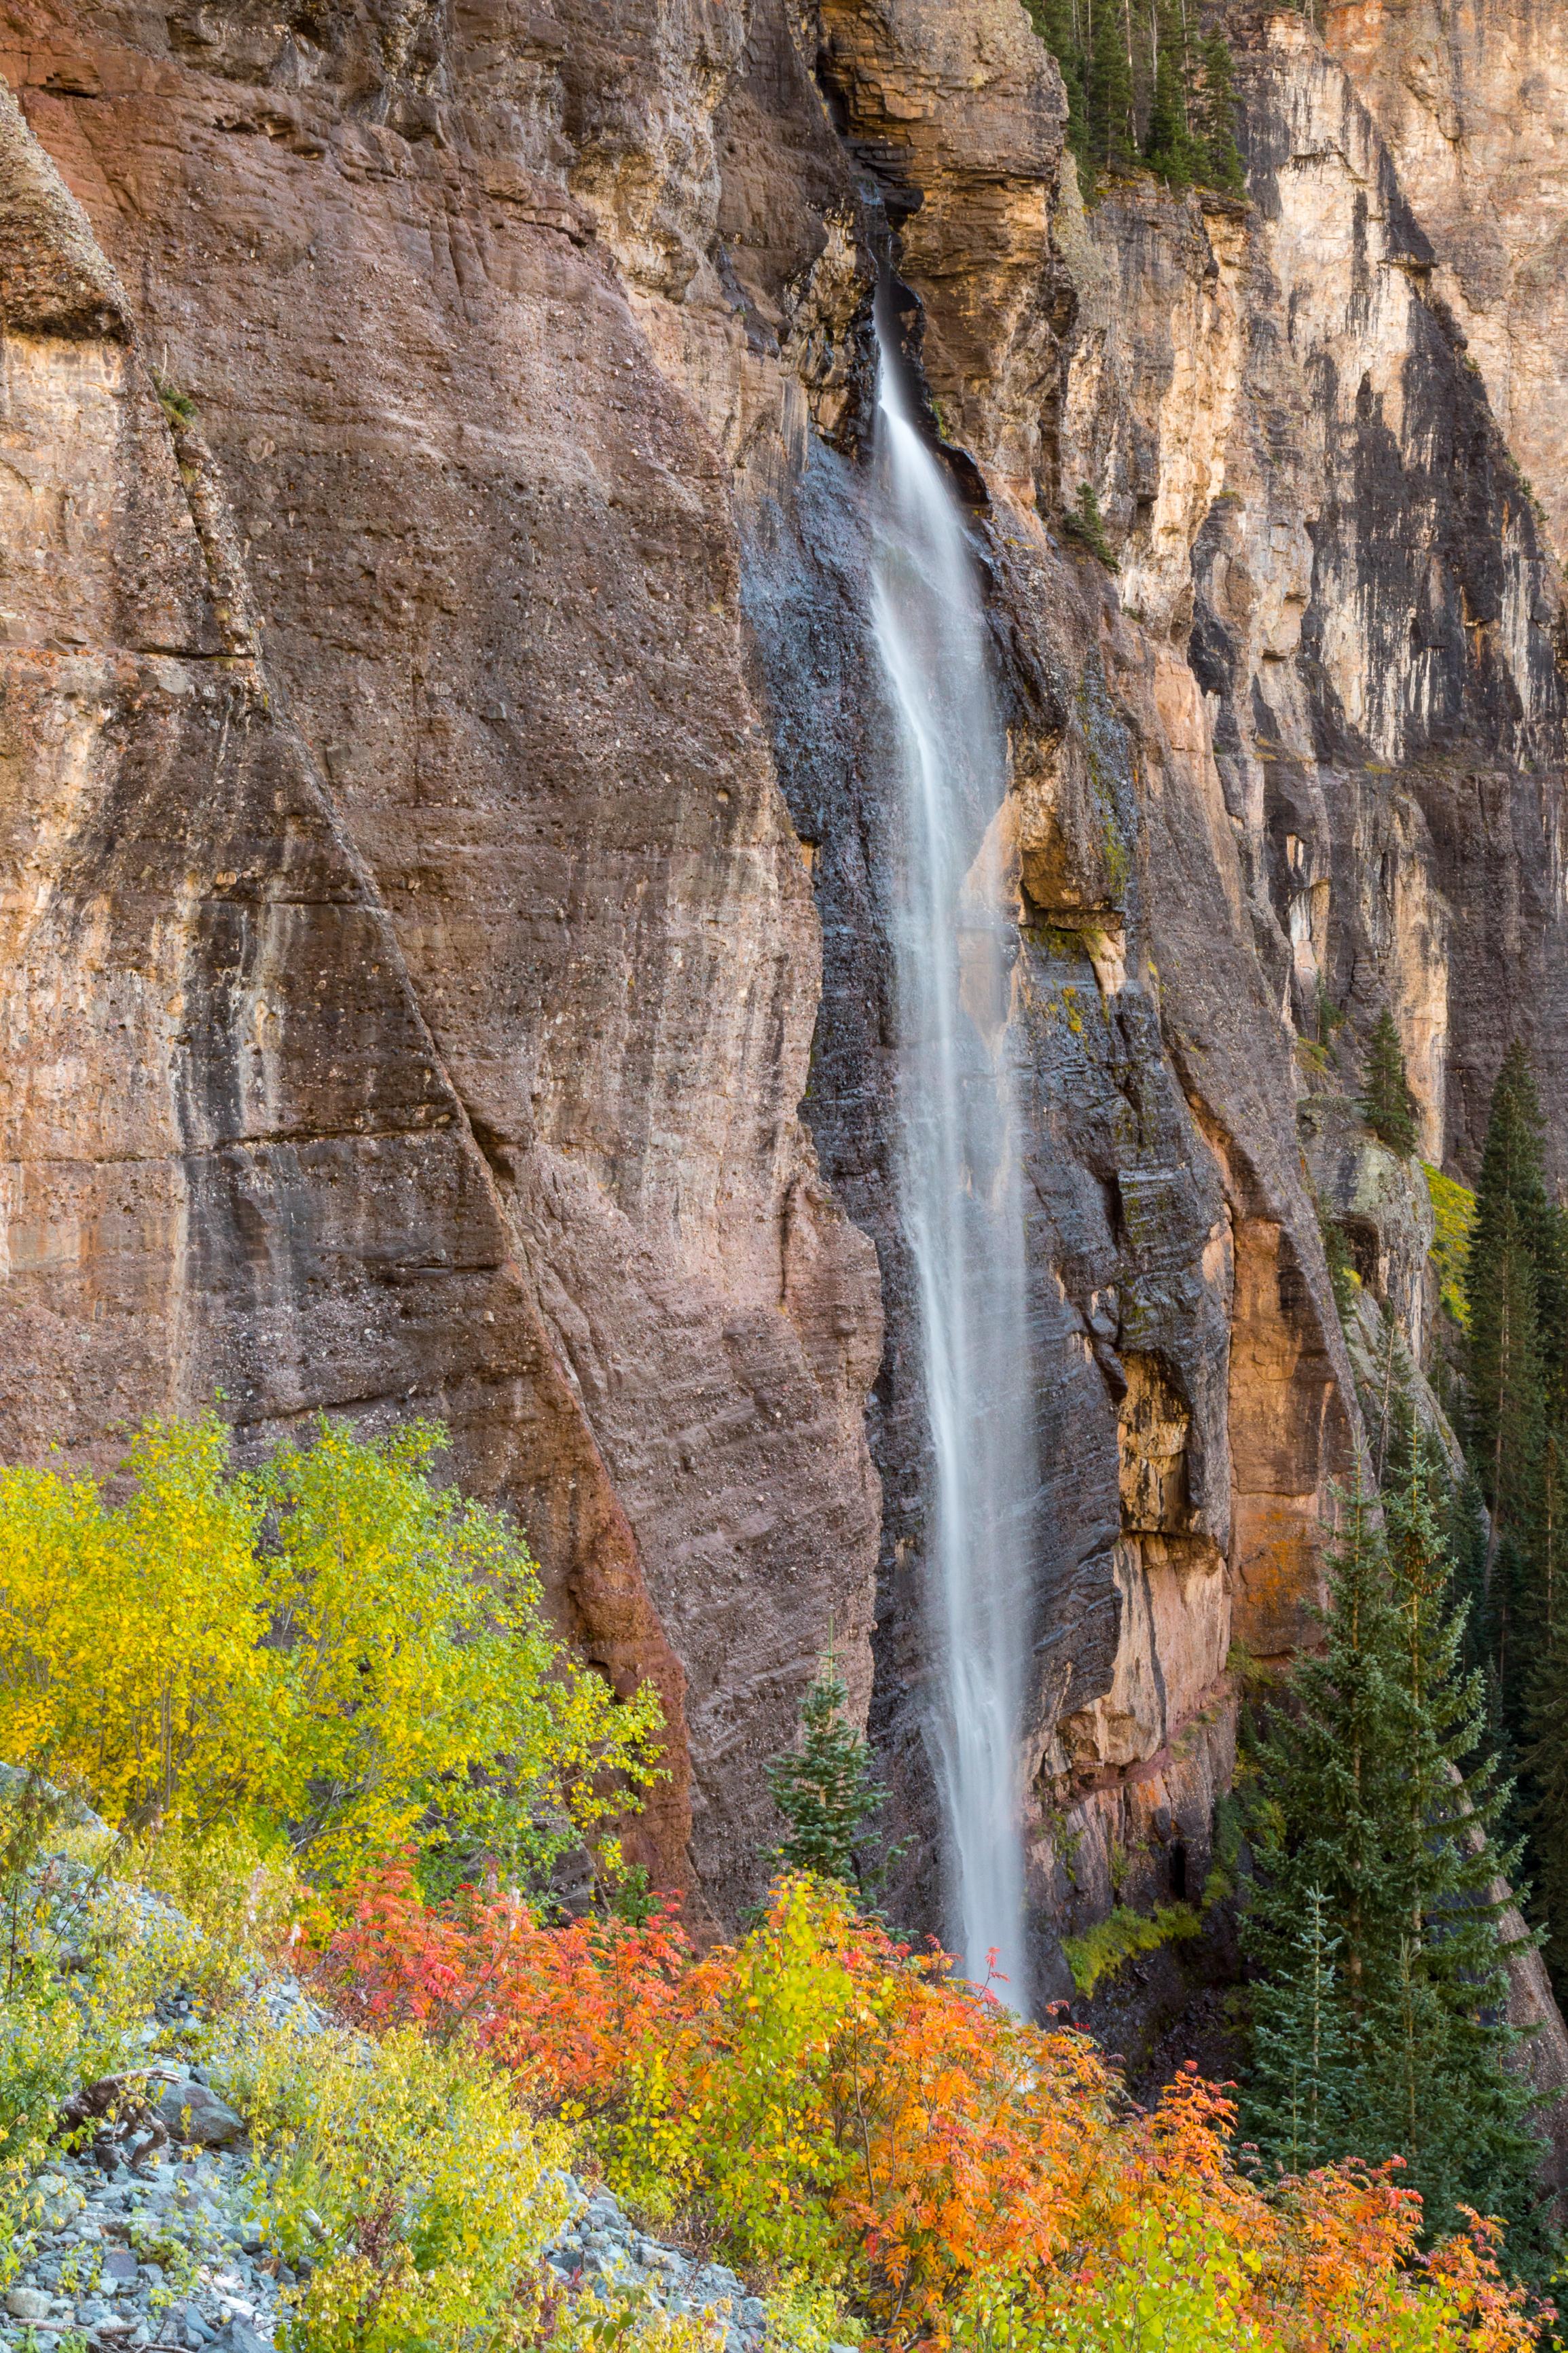 Bridal Veil Falls, Telluride, Image # 3174